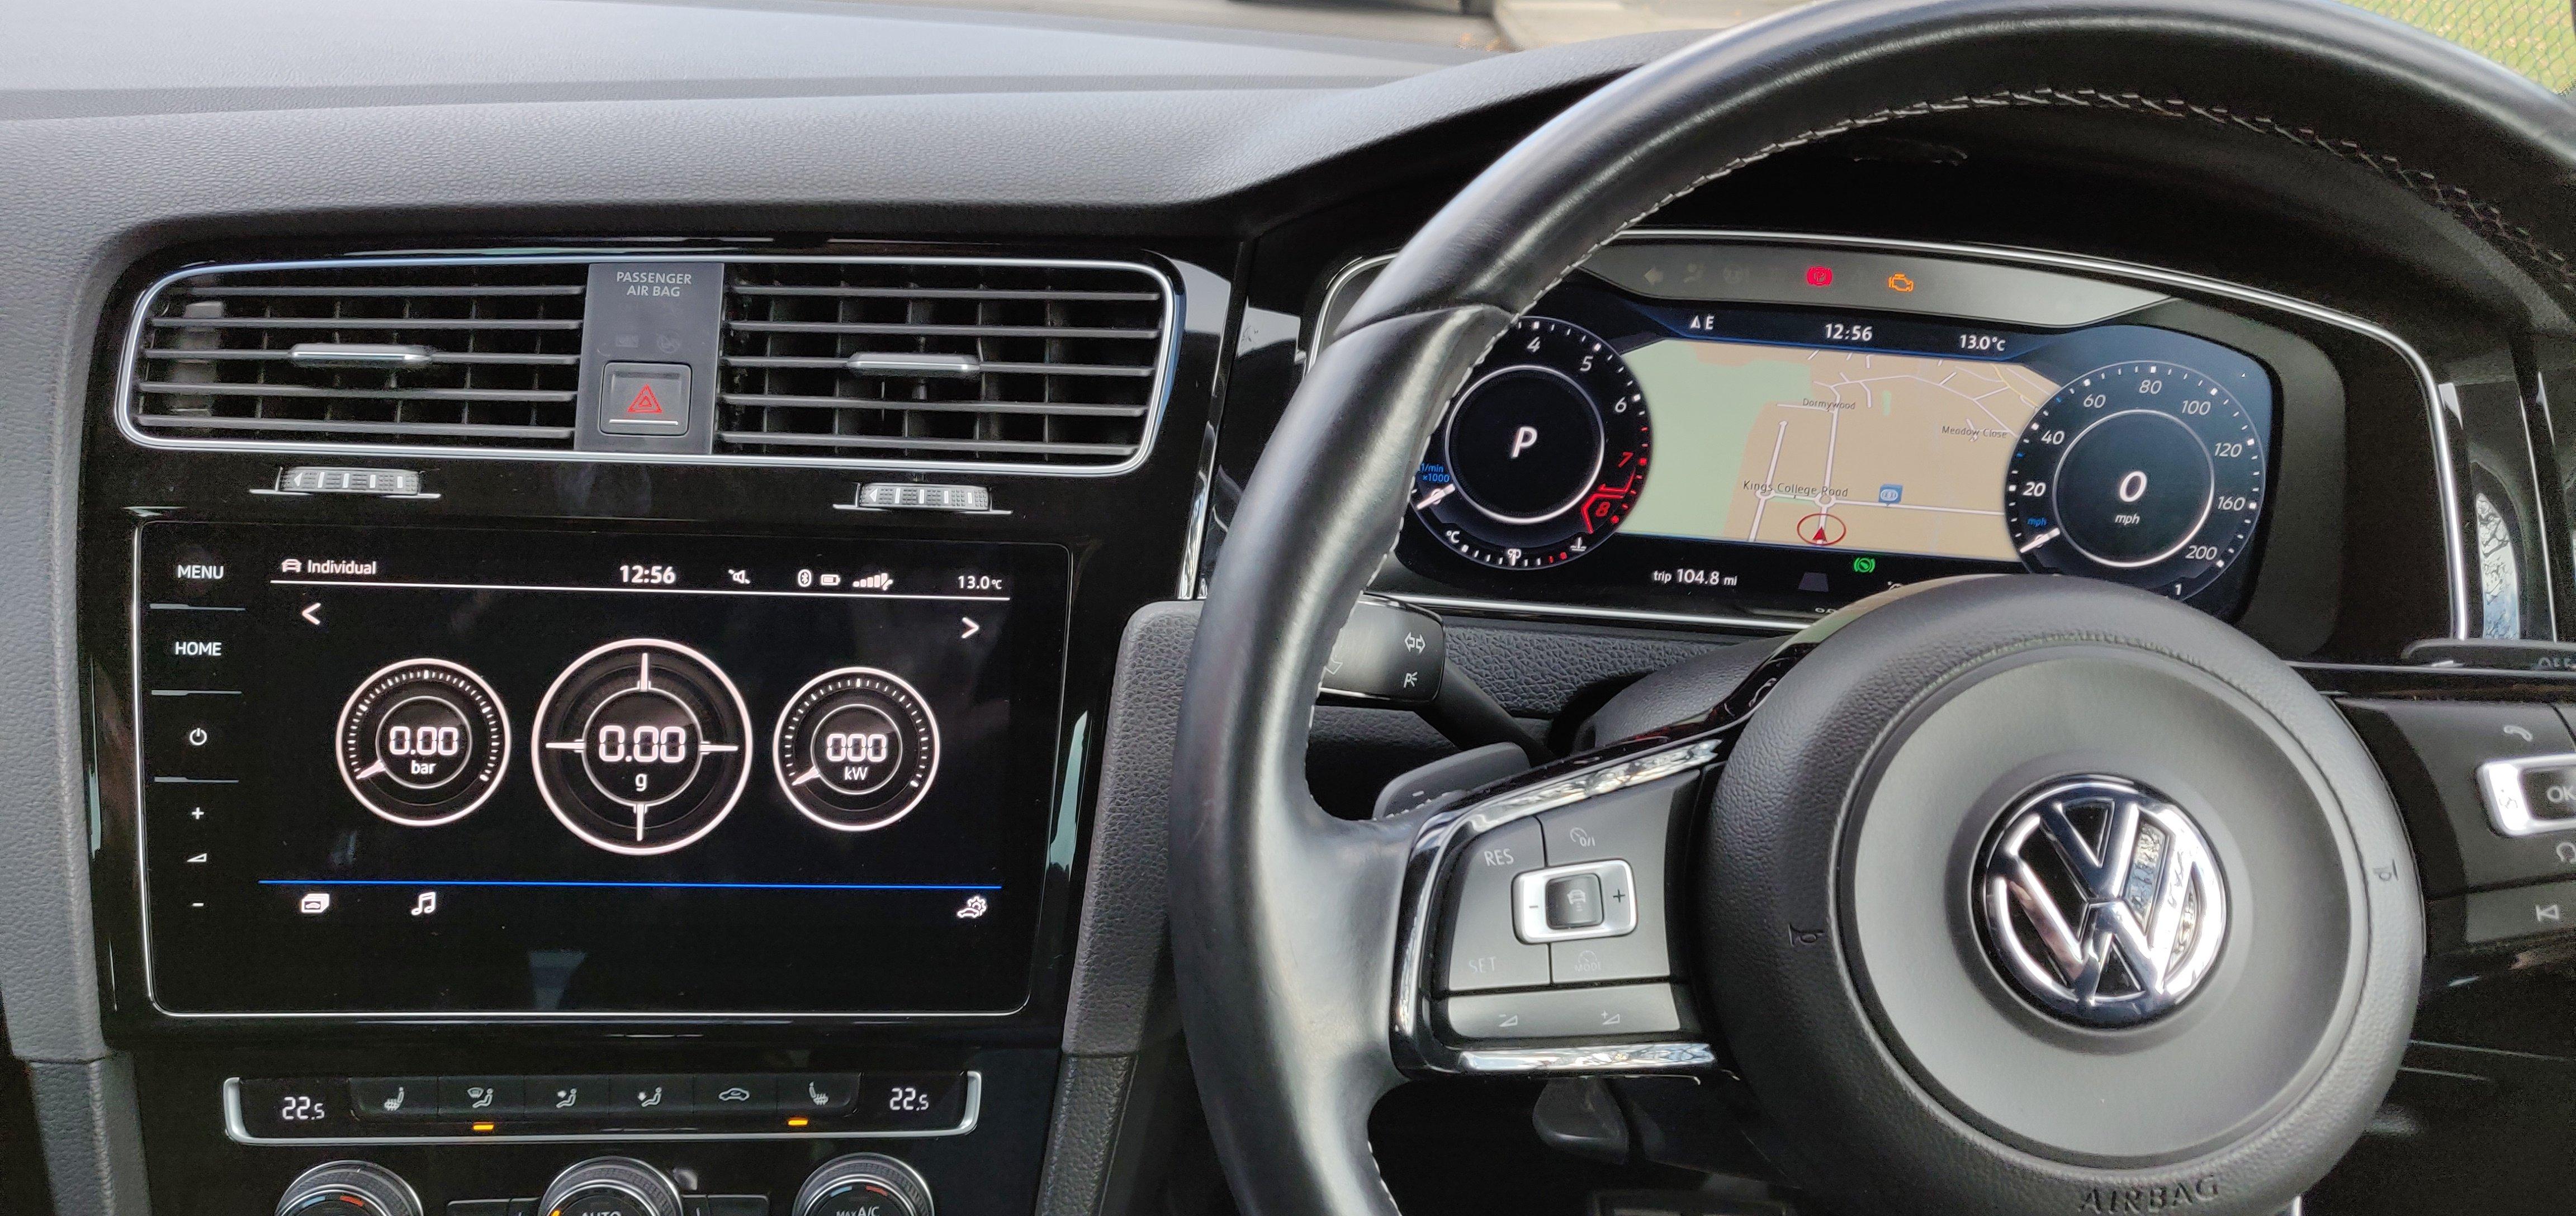 Digital Cockpit (Active Info Display) & 9 2